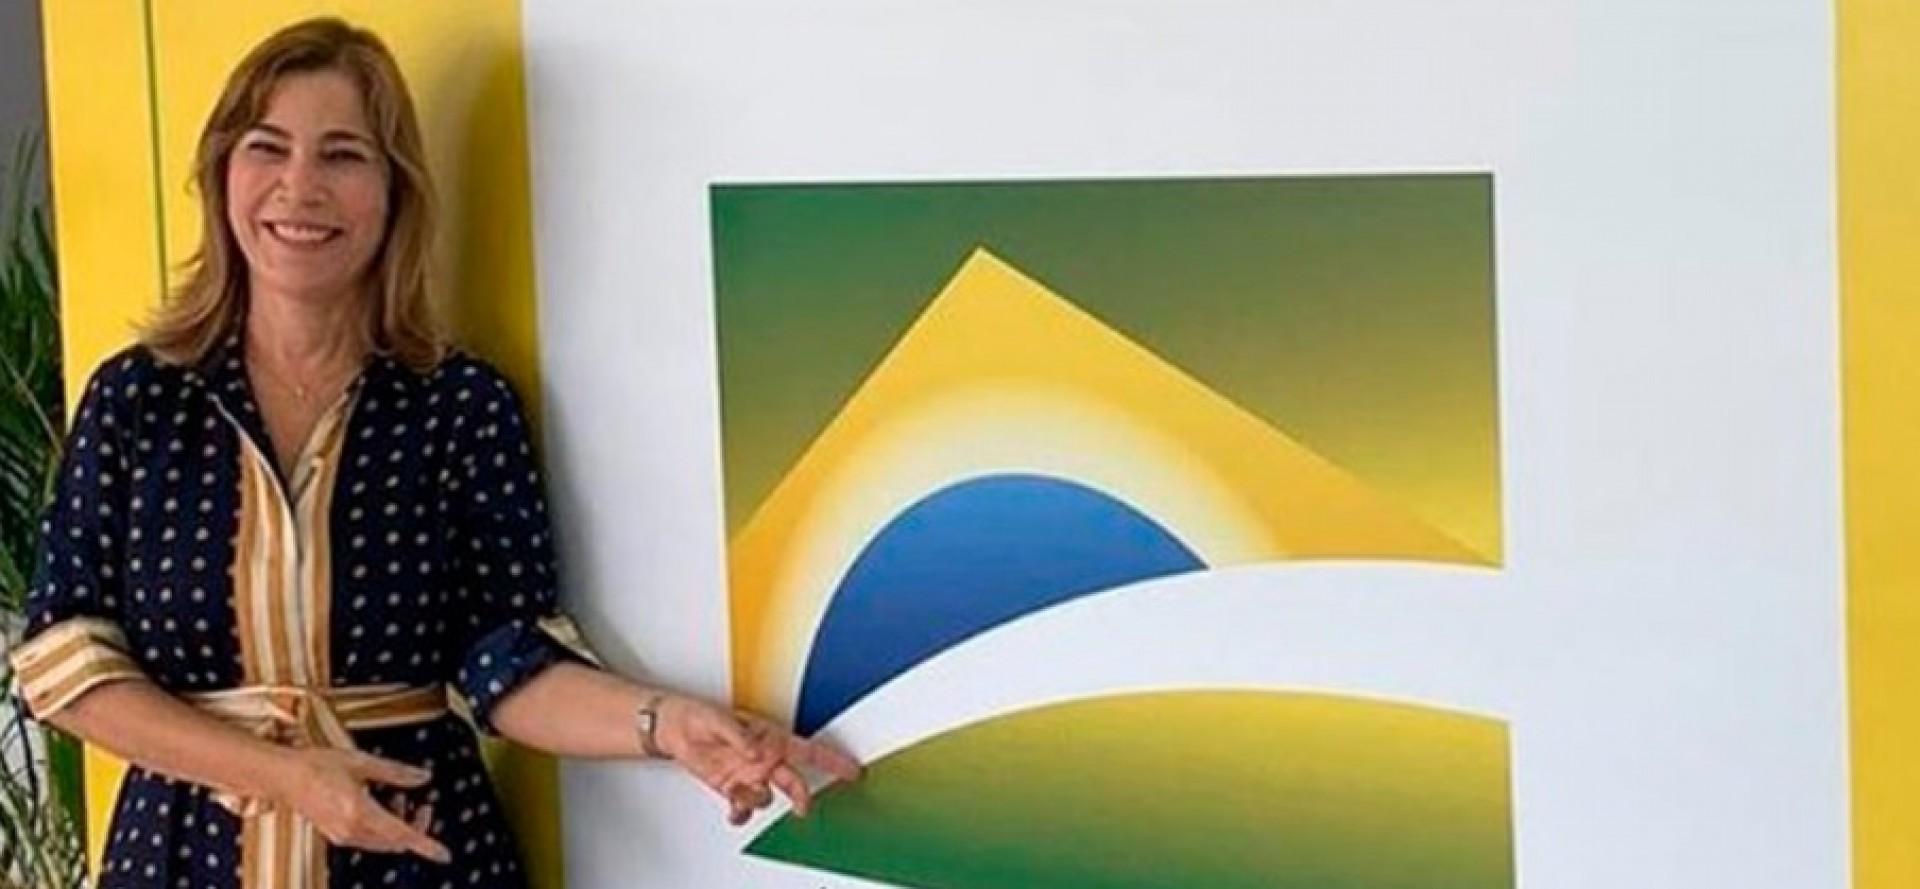 Mayra nega pedido de silêncio para depoimento na CPI